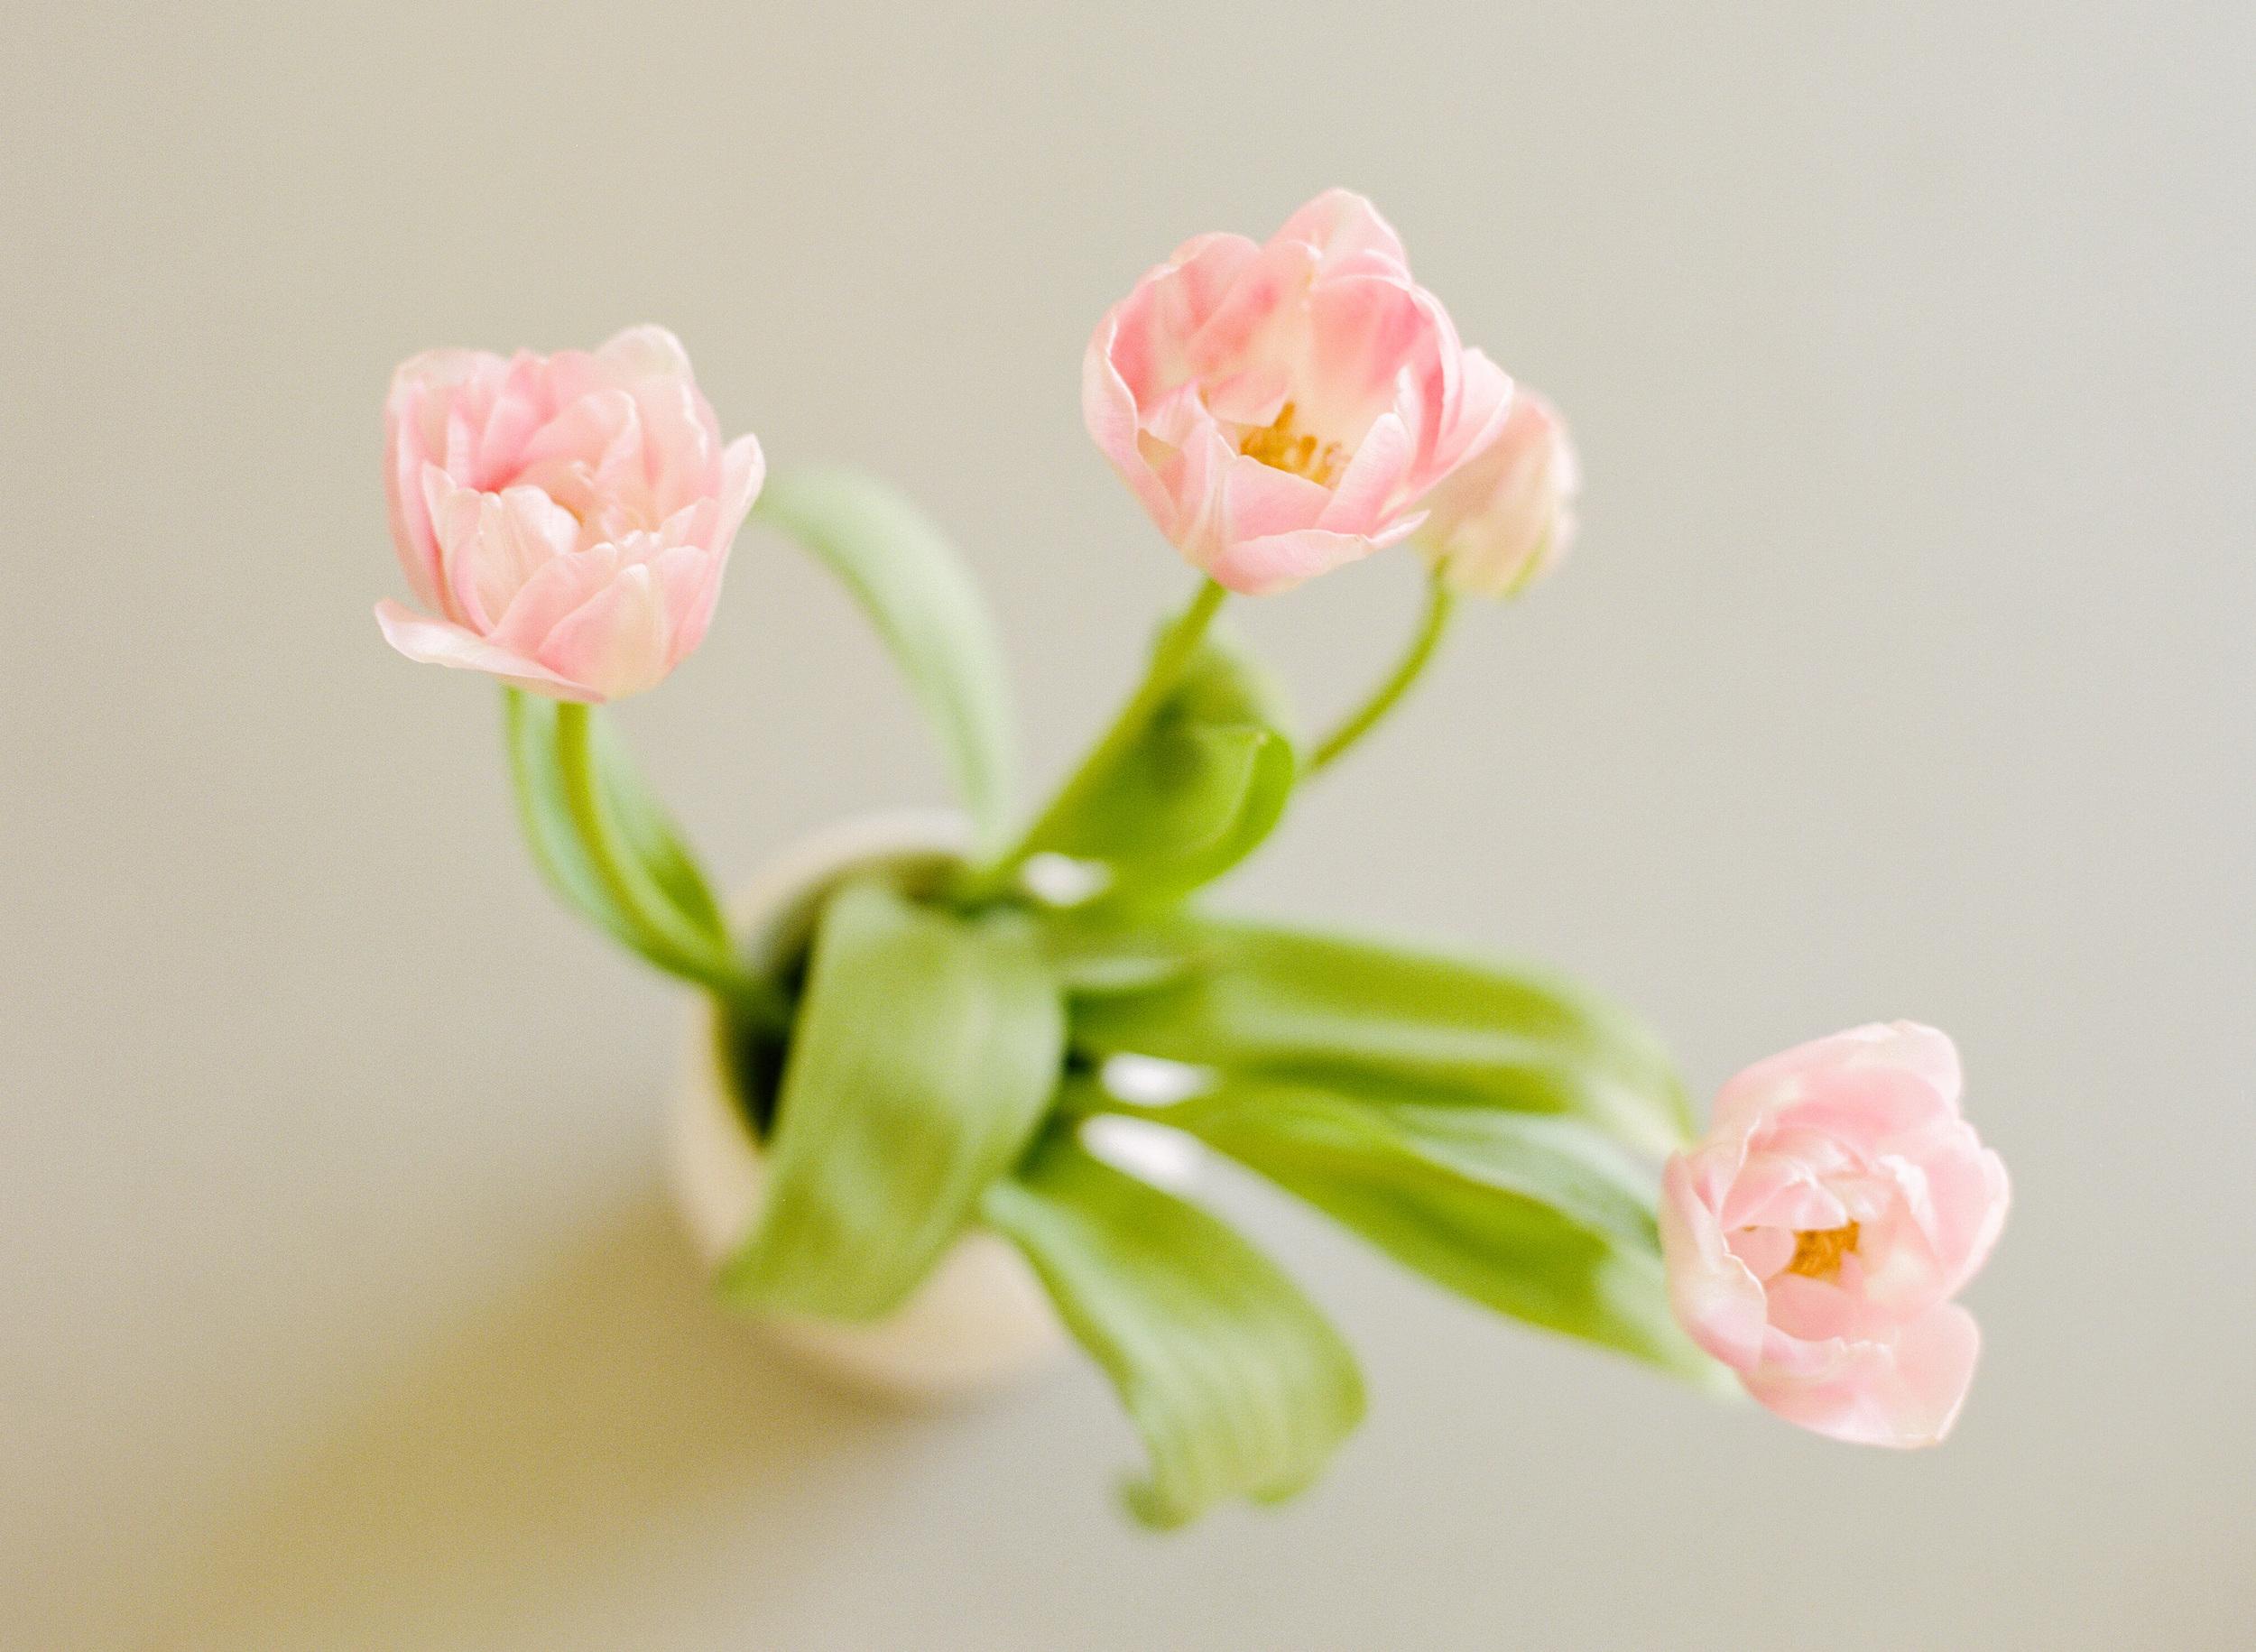 Andrea Naylor Photography Blossoms-000077520012 (1).jpg